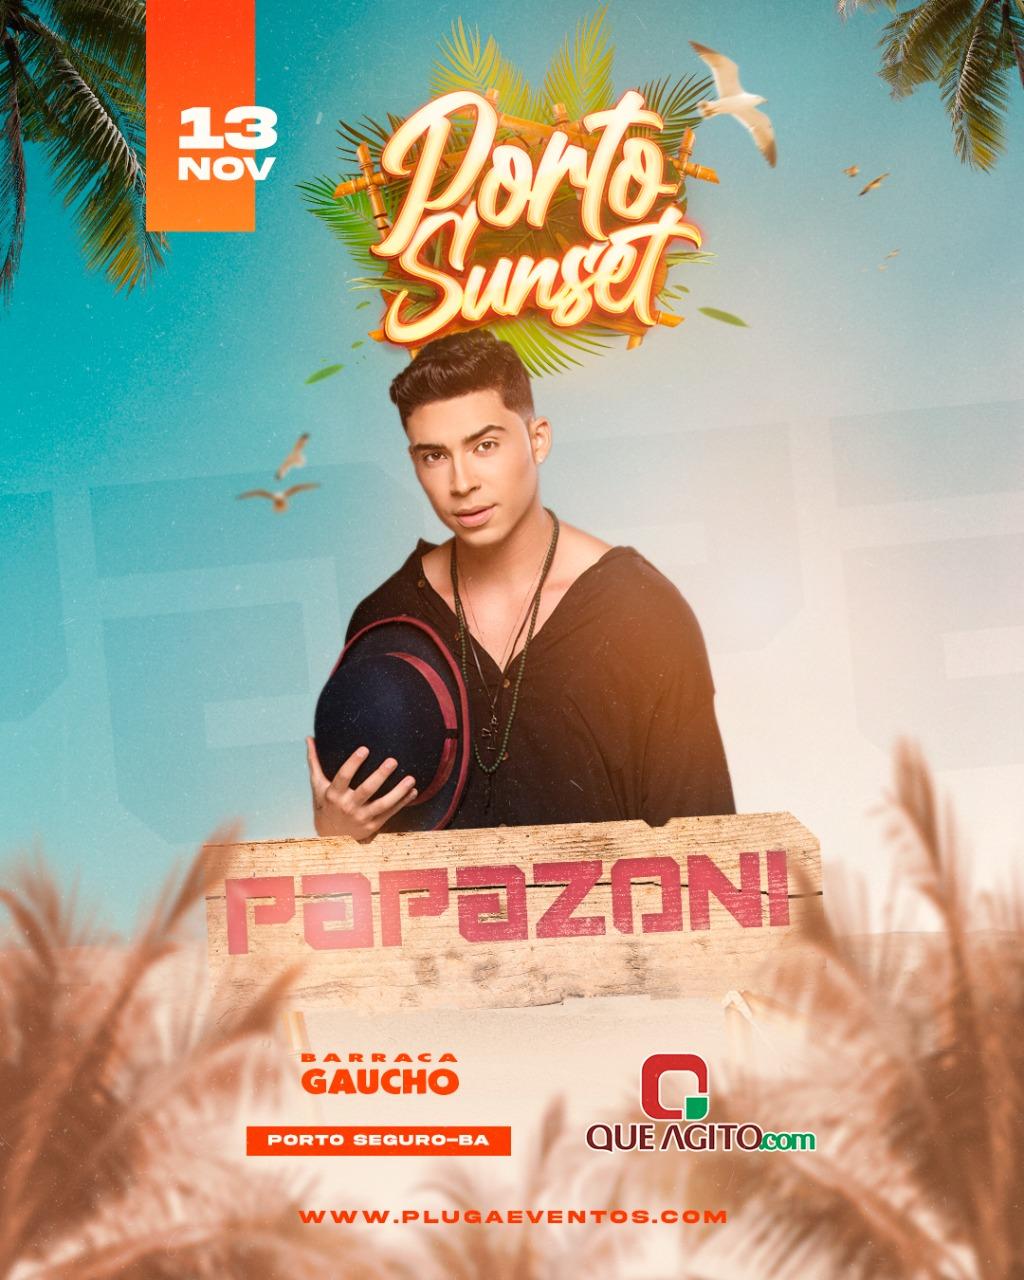 Papazoni está de volta a Porto Seguro, com mega show marcado para o dia 13 de novembro 23